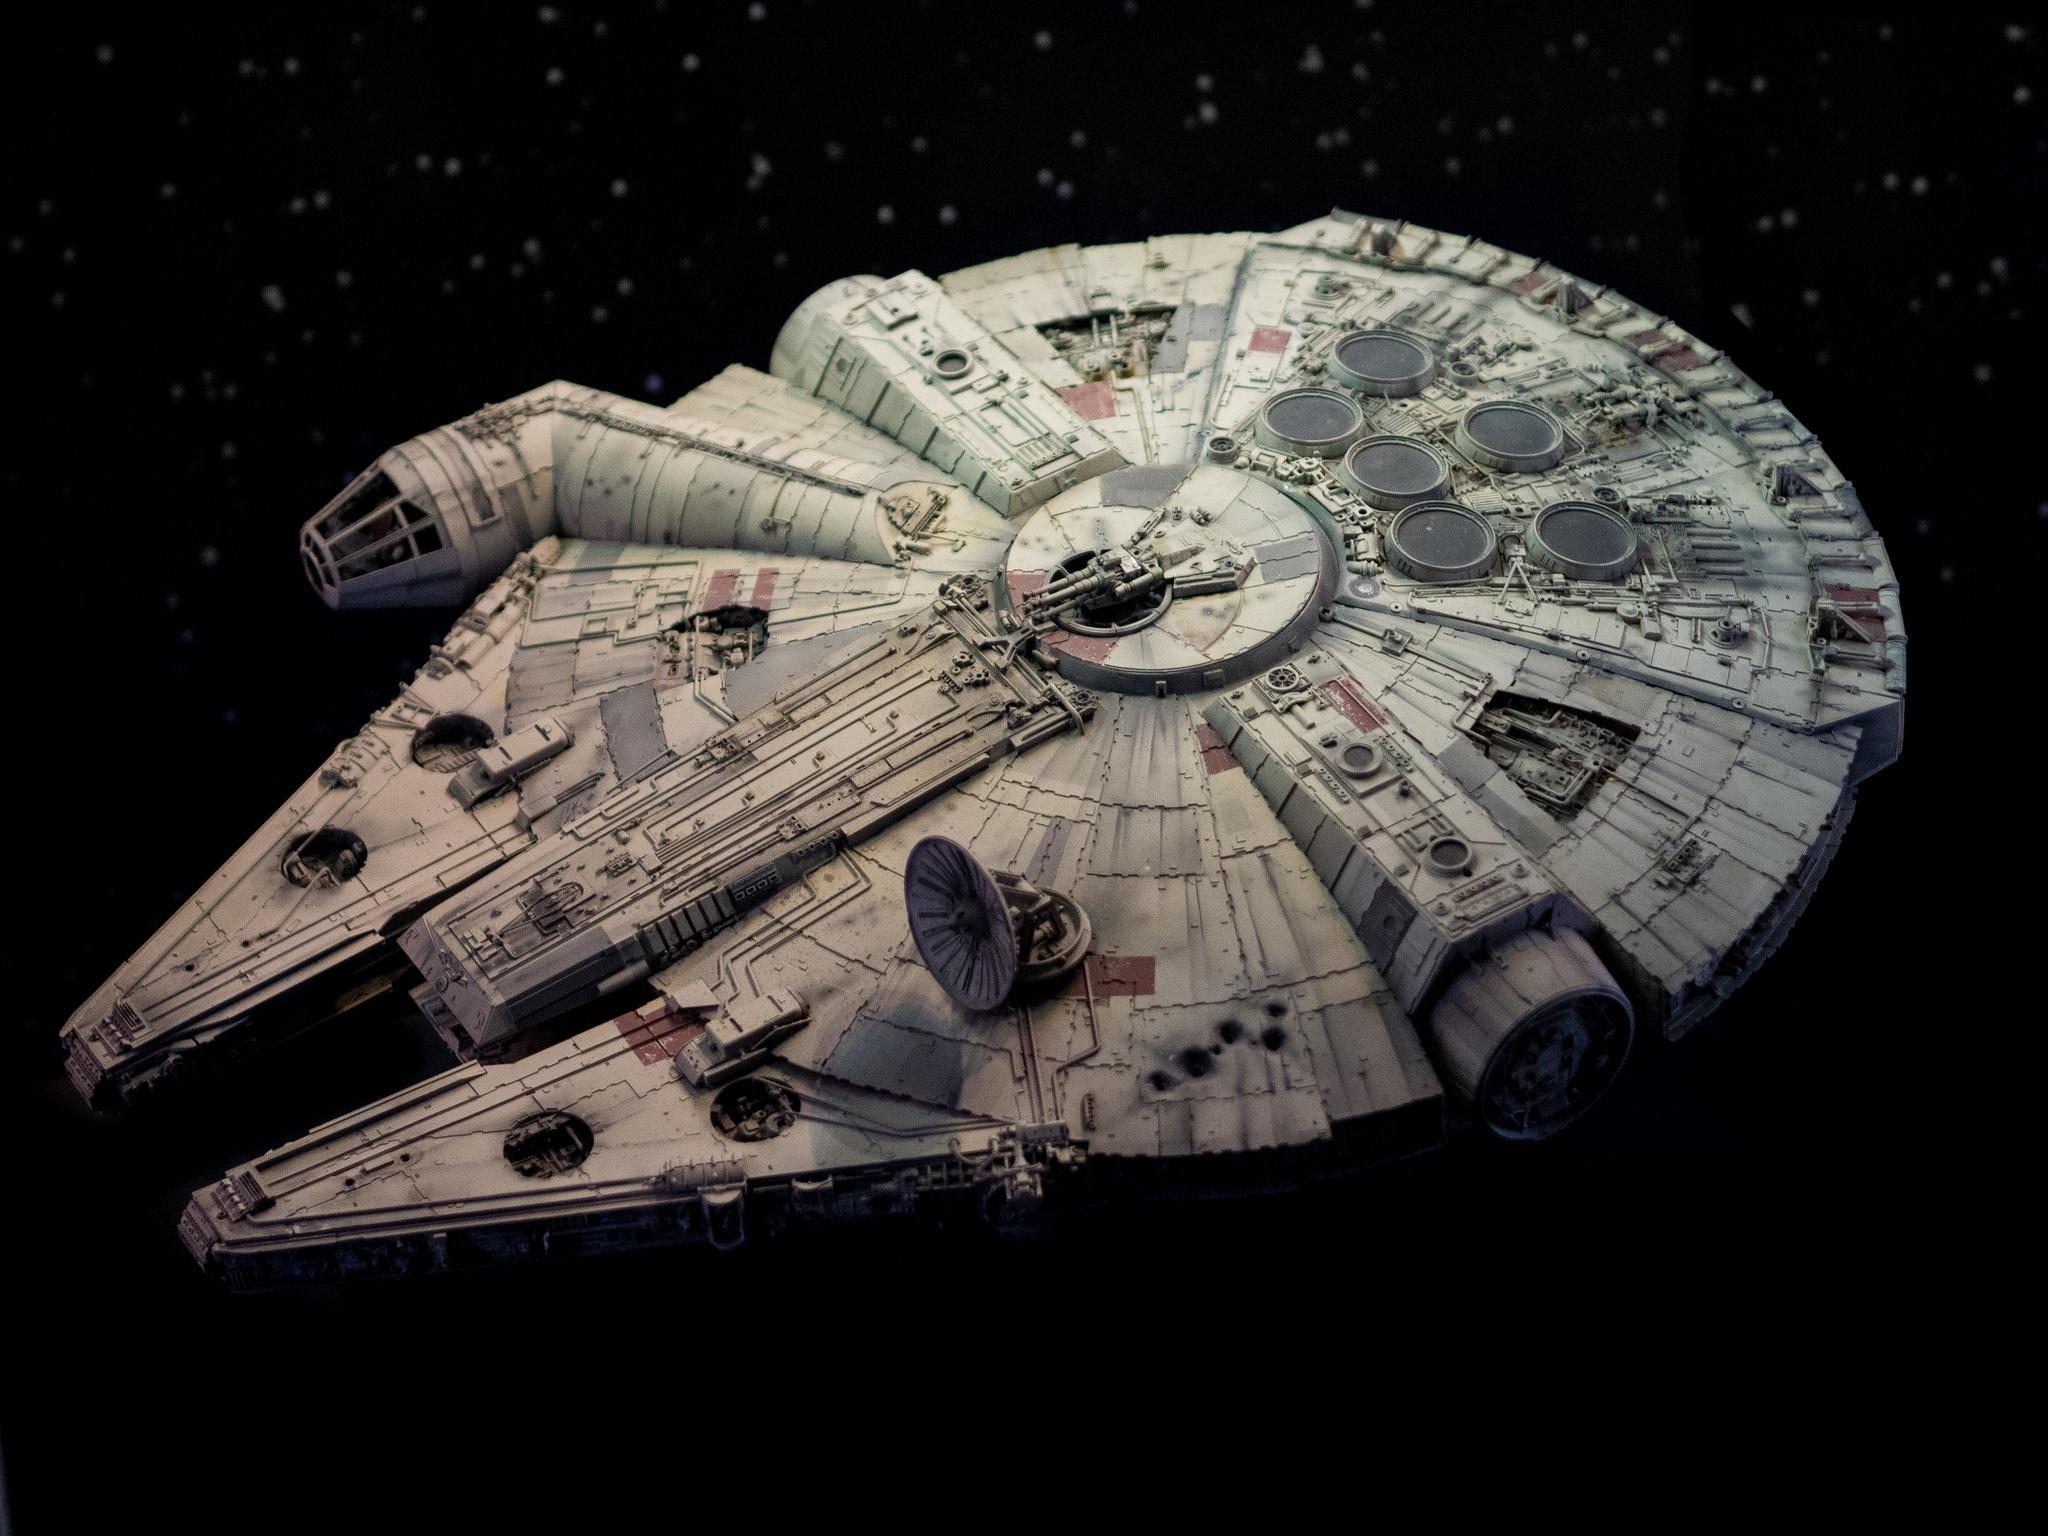 Millennium-Falcon.jpg